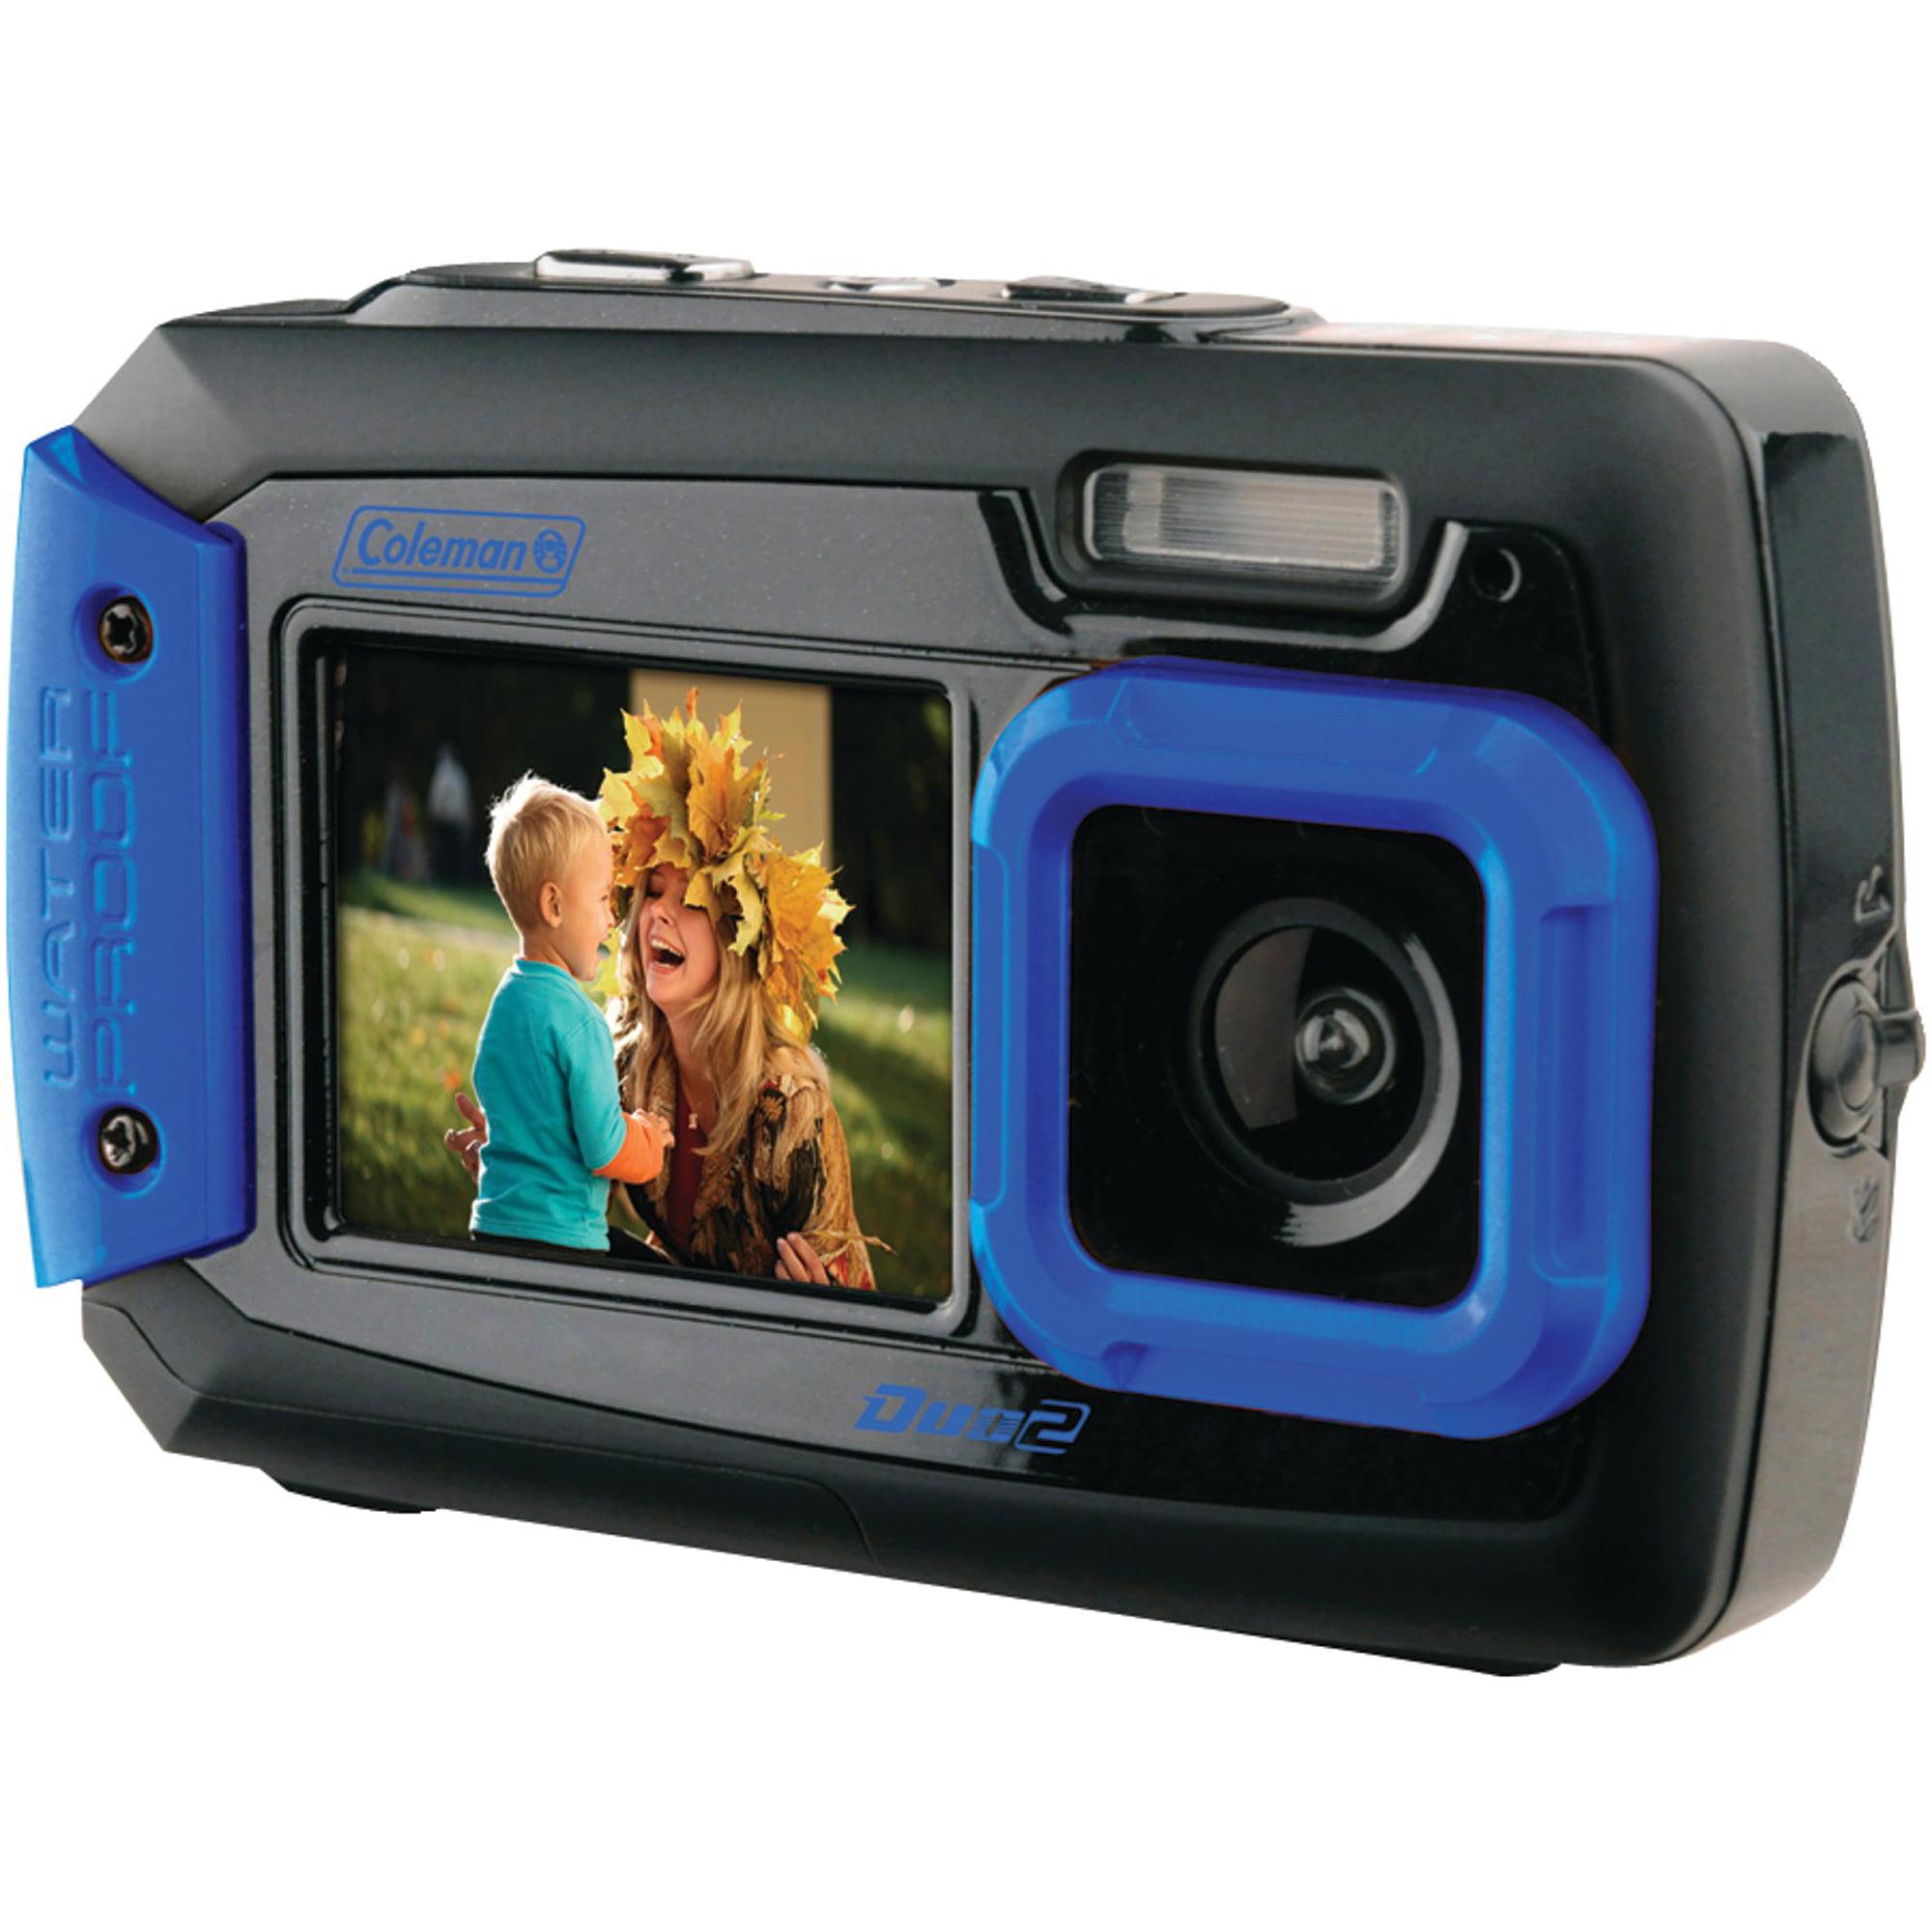 Coleman 2V9WP Duo2 Dual-Screen Waterproof 20MP Digital Camera, Blue